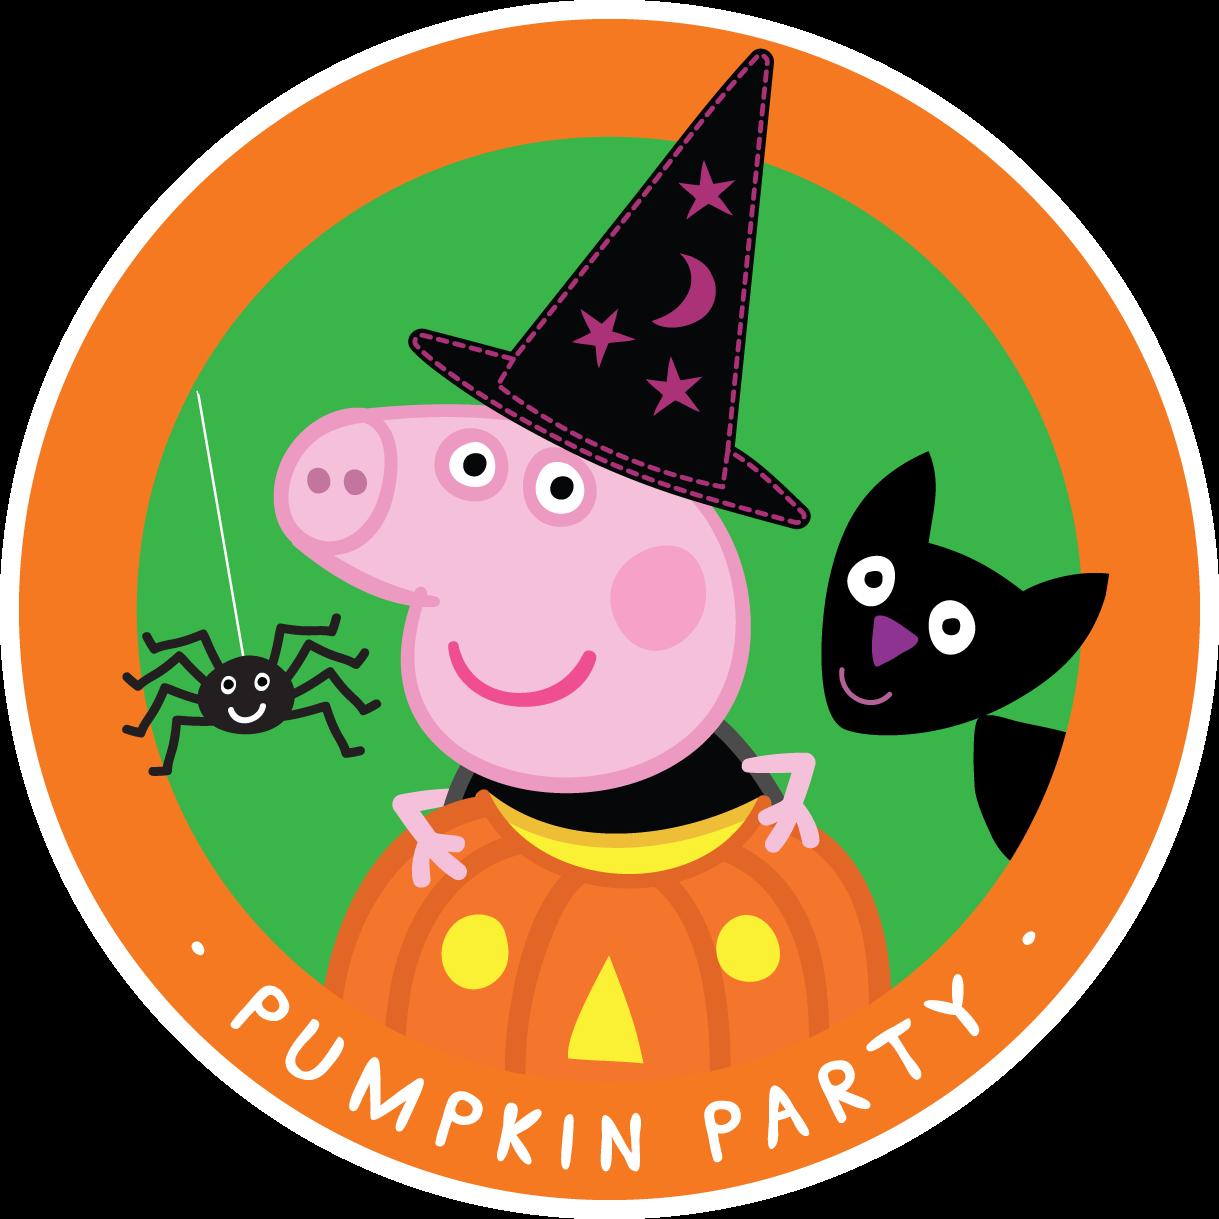 Pig halloween clipart vector transparent Peppa Pig Drawing Templates (50 Images) - Class Room Teacher vector transparent